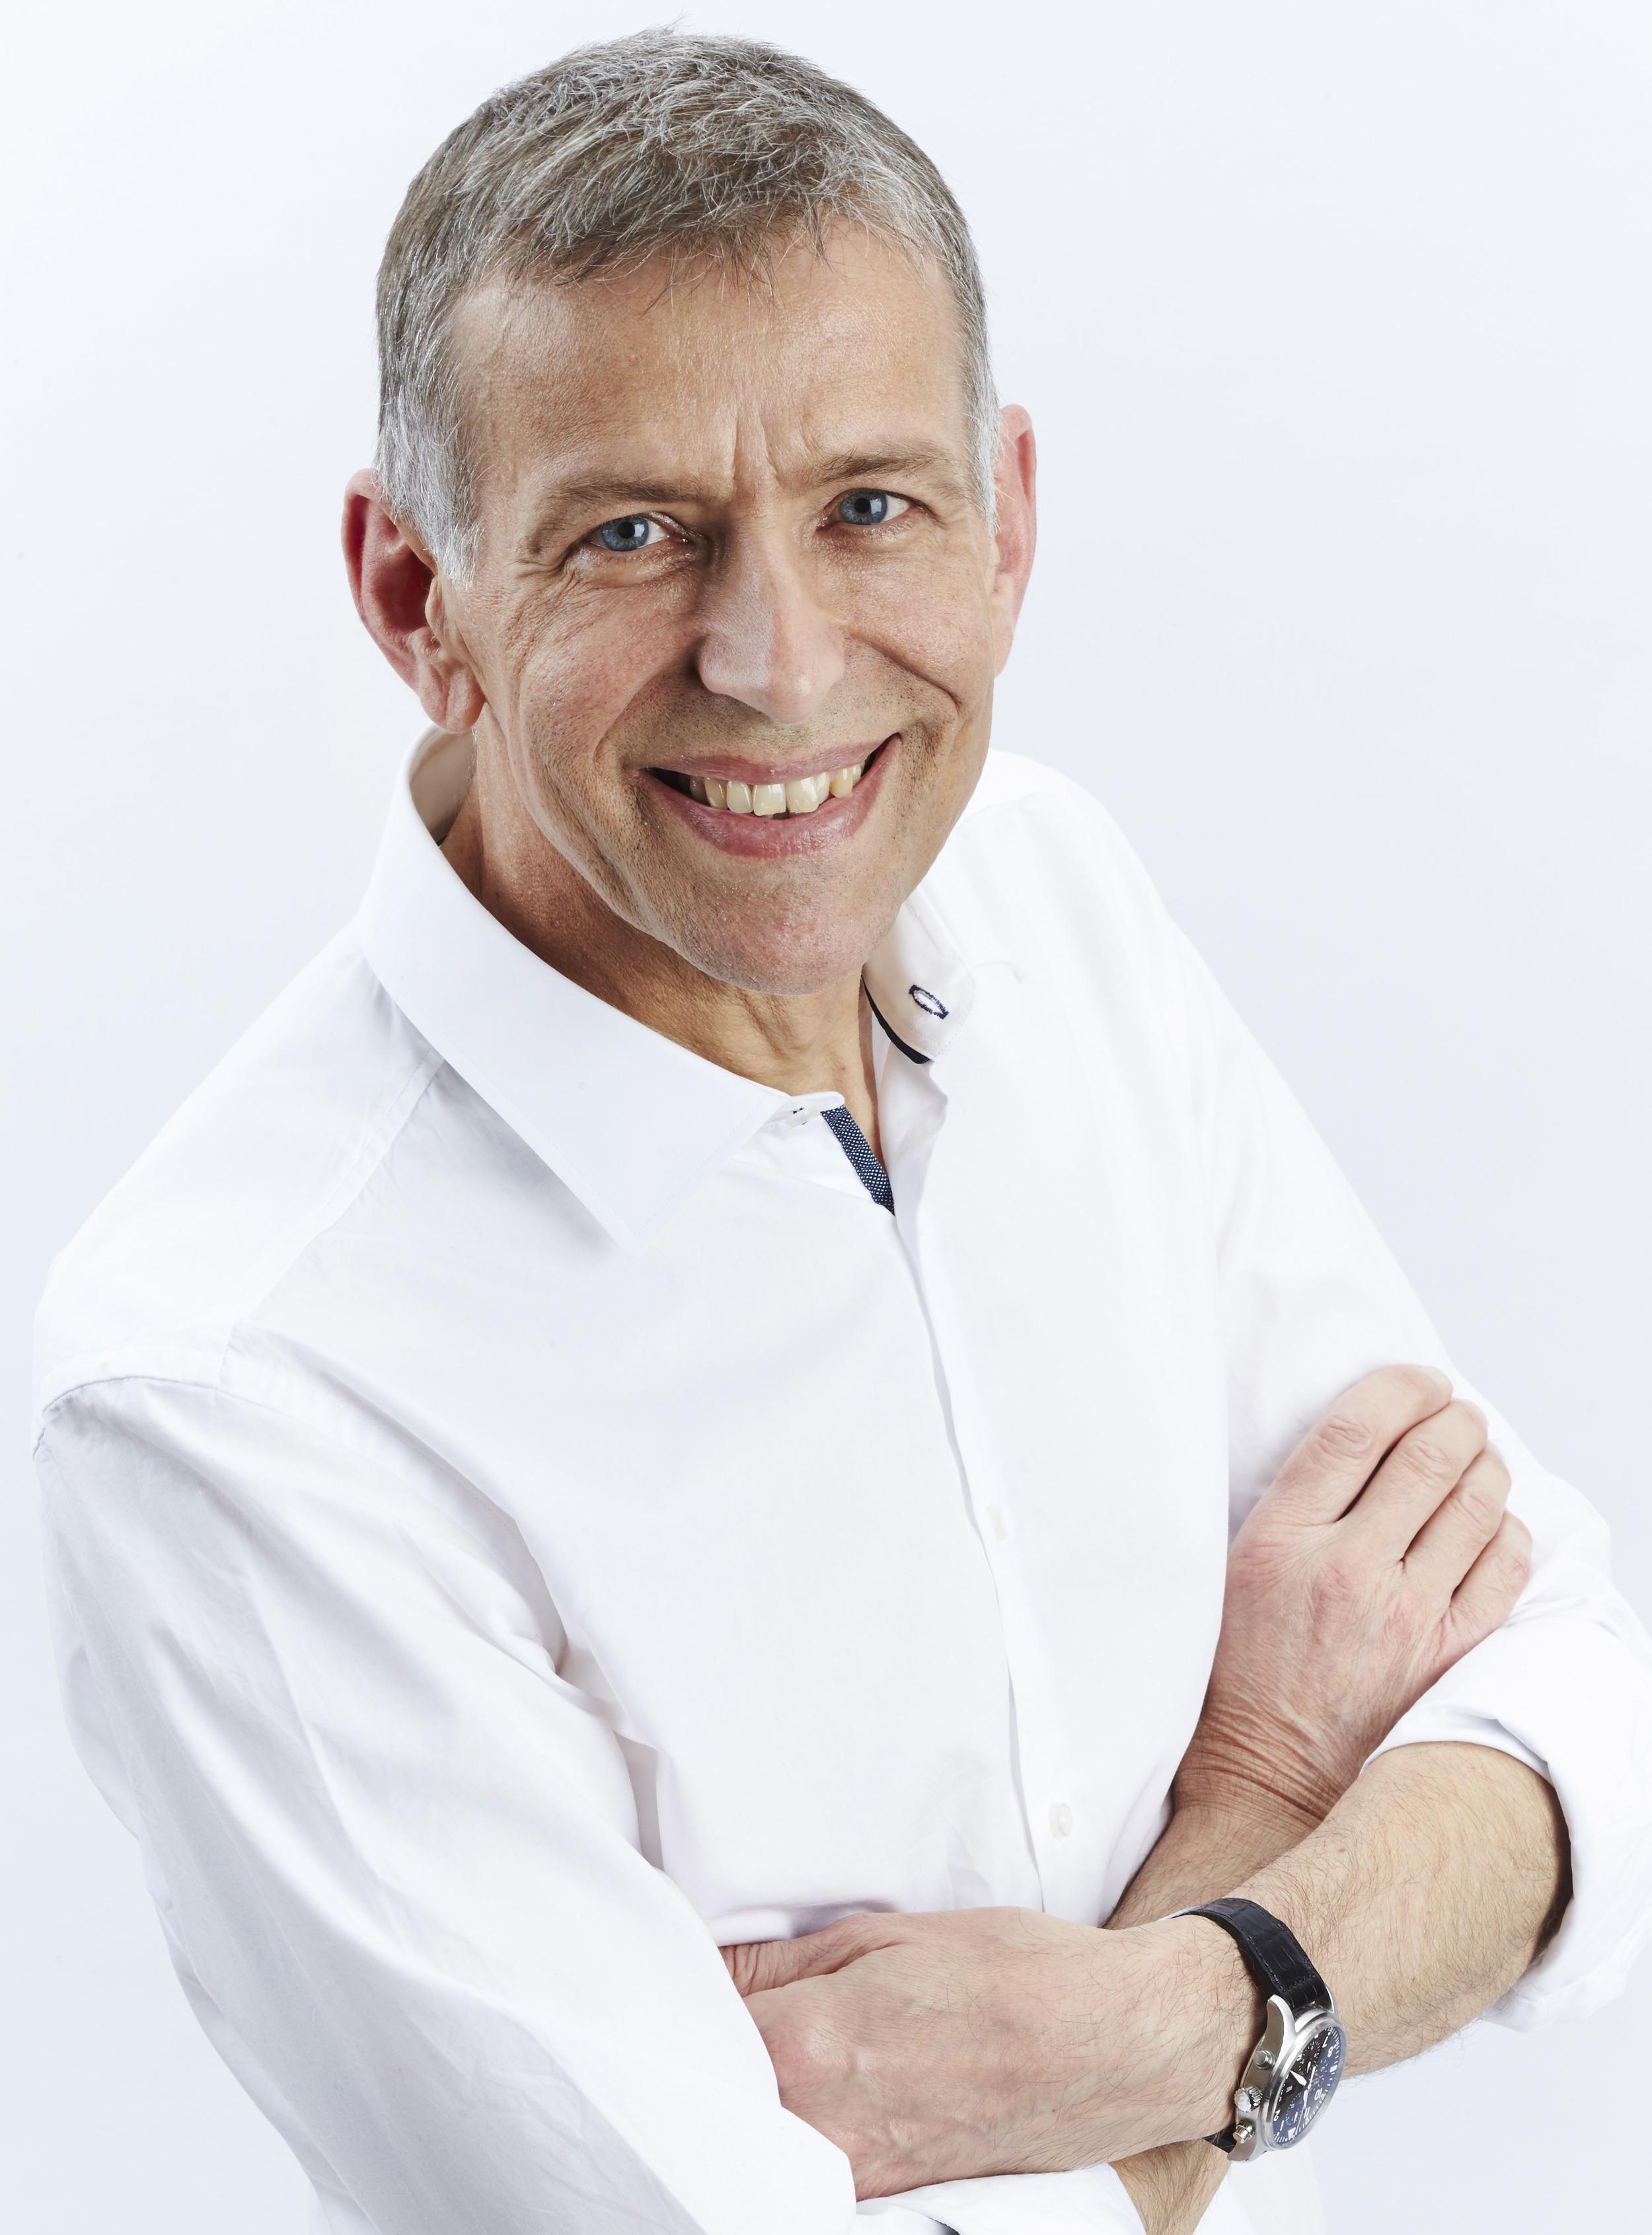 Peter-Baranyovits-Consultant-Eye-Surgeon